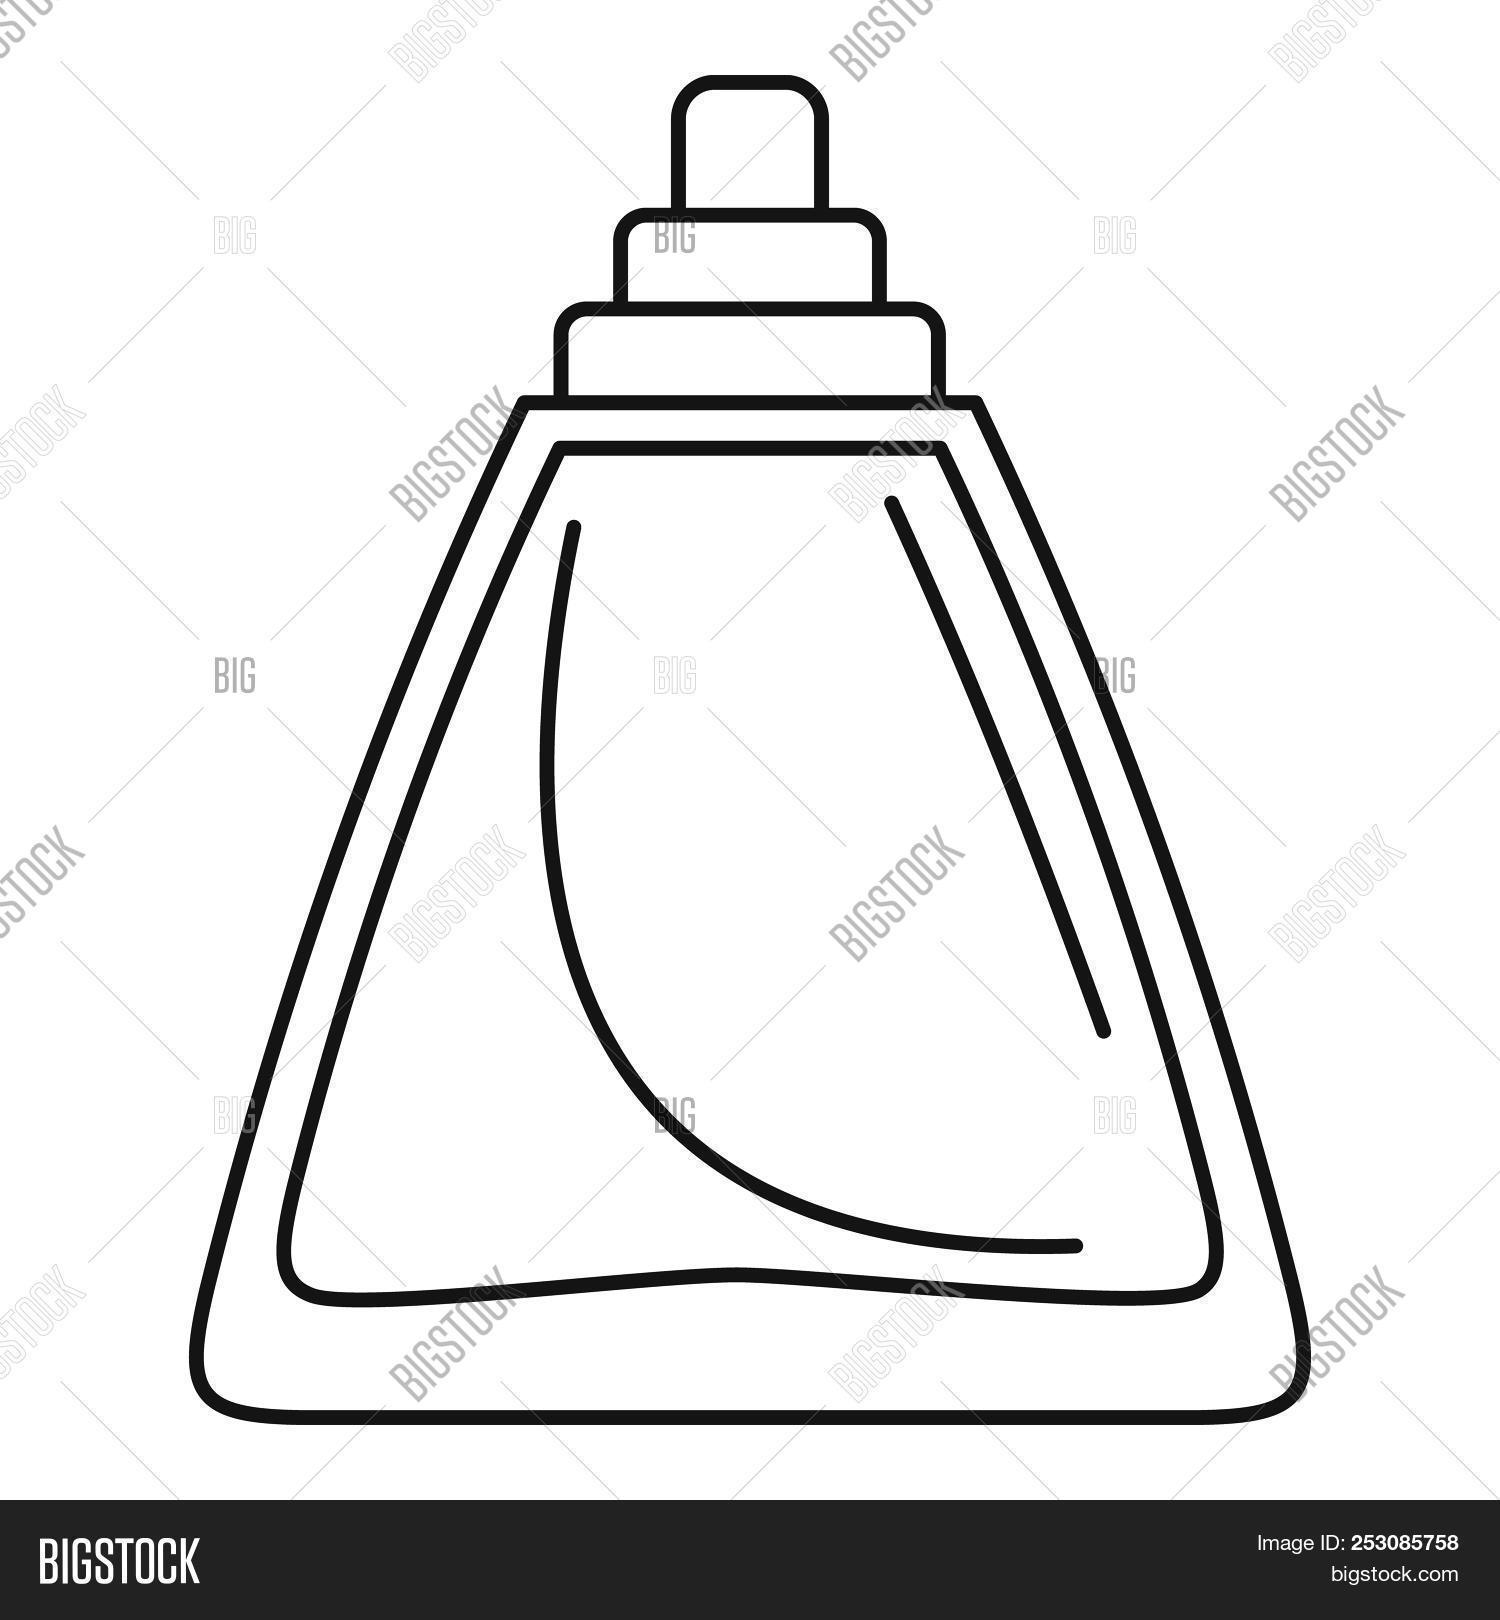 1500x1620 deodorant bottle icon outline deodorant bottle icon for web